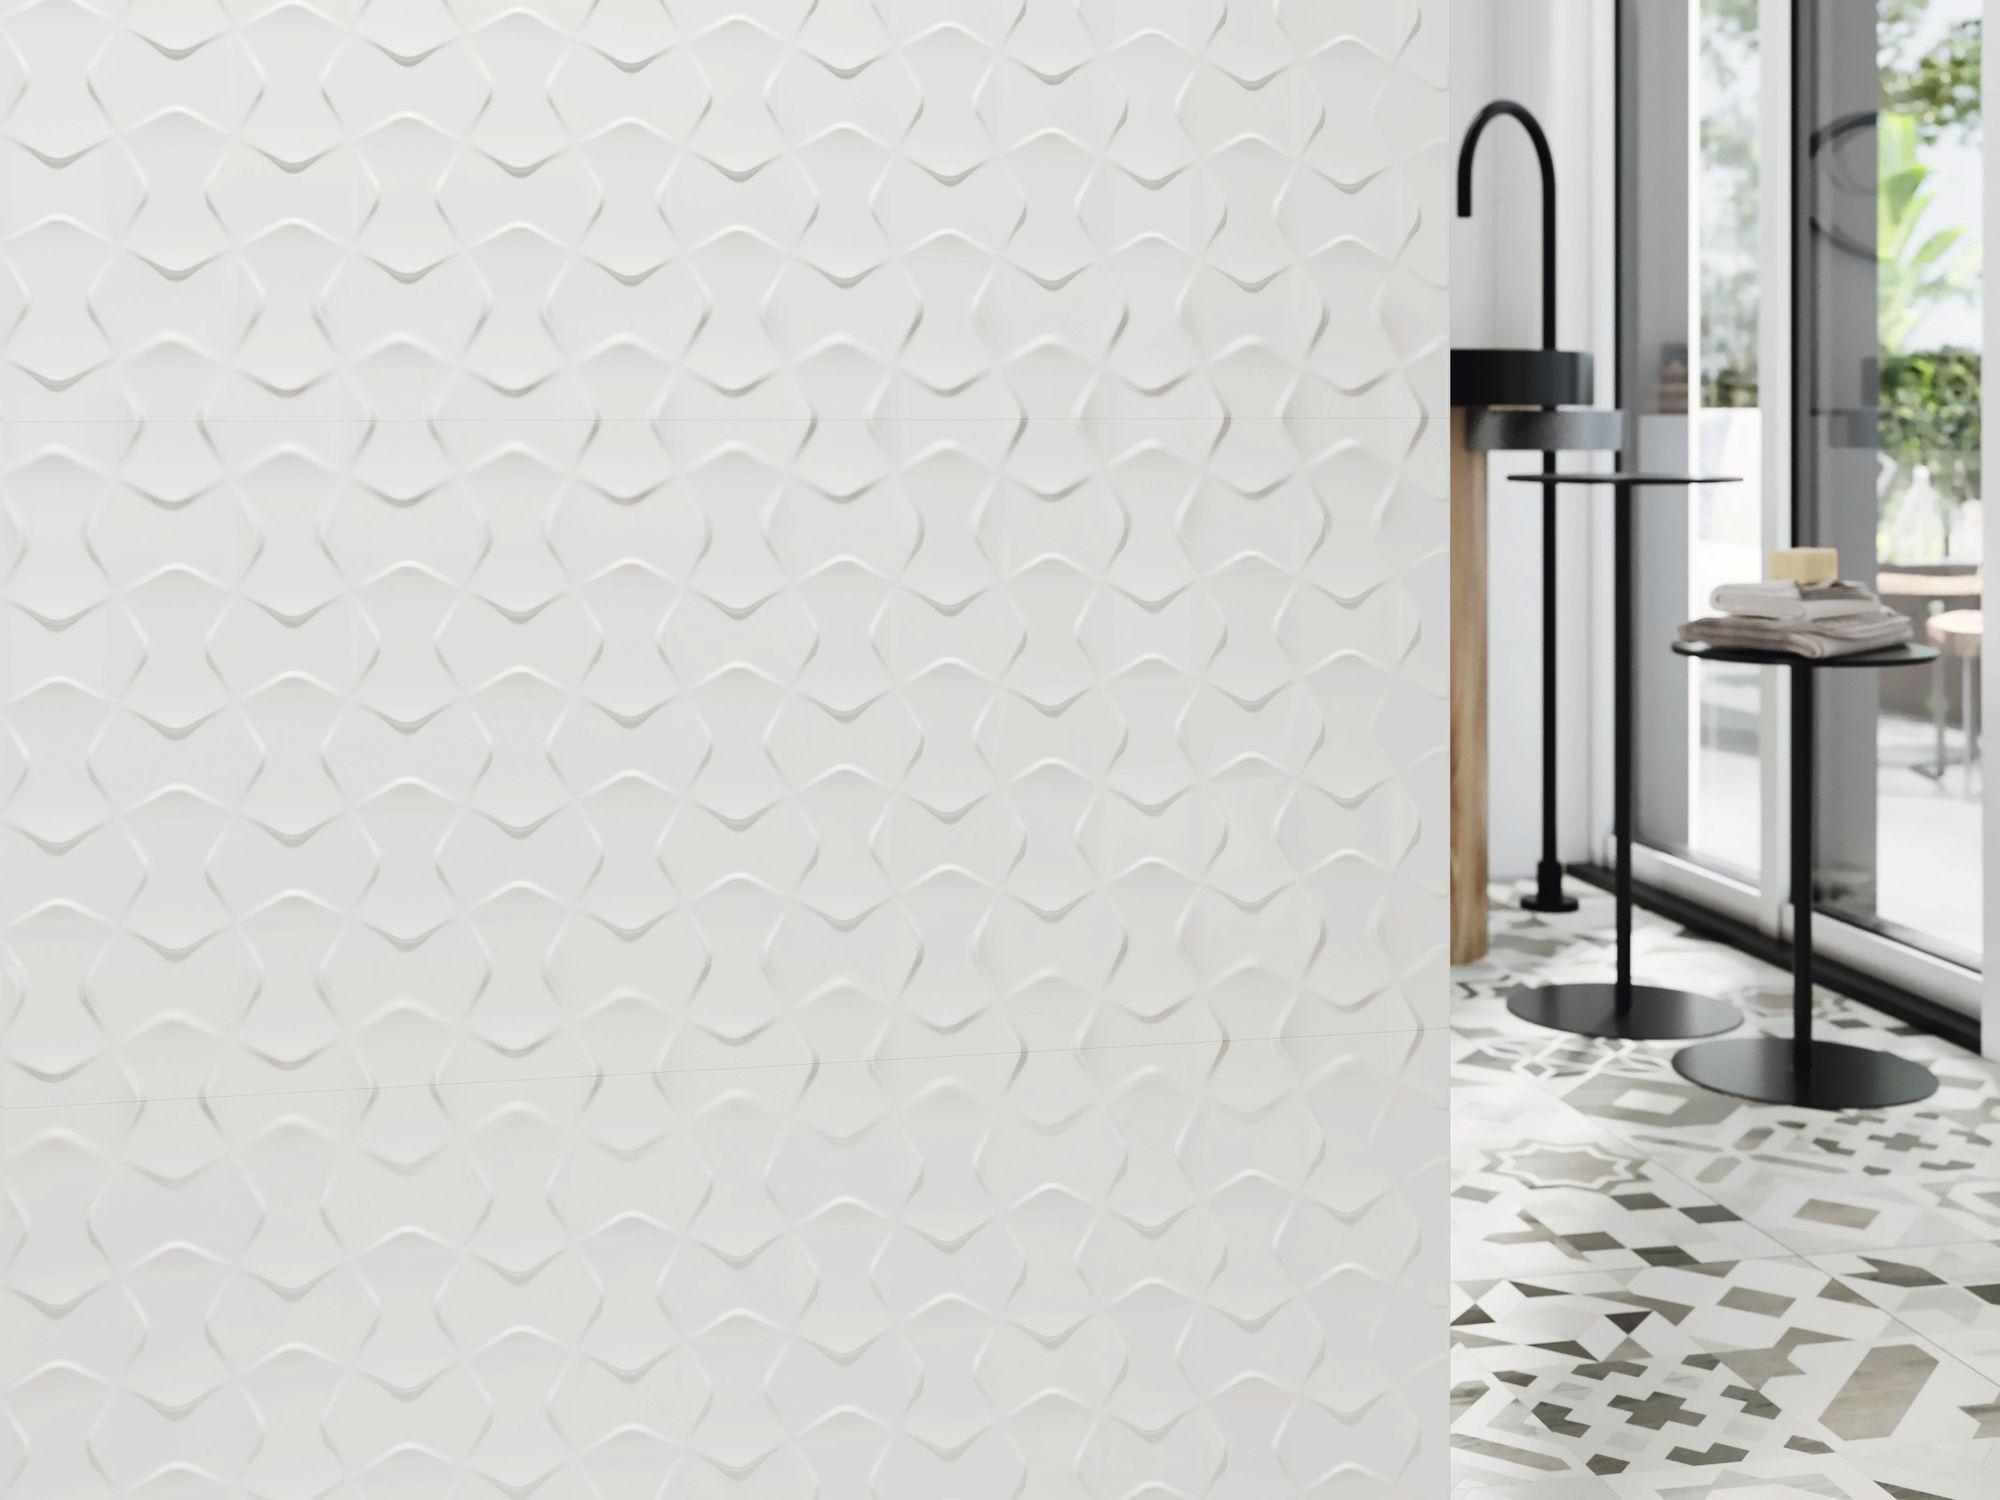 Blanco Brillo relieve Bowtie 40x120 cm. Pavimento Hidraulico Phuket.